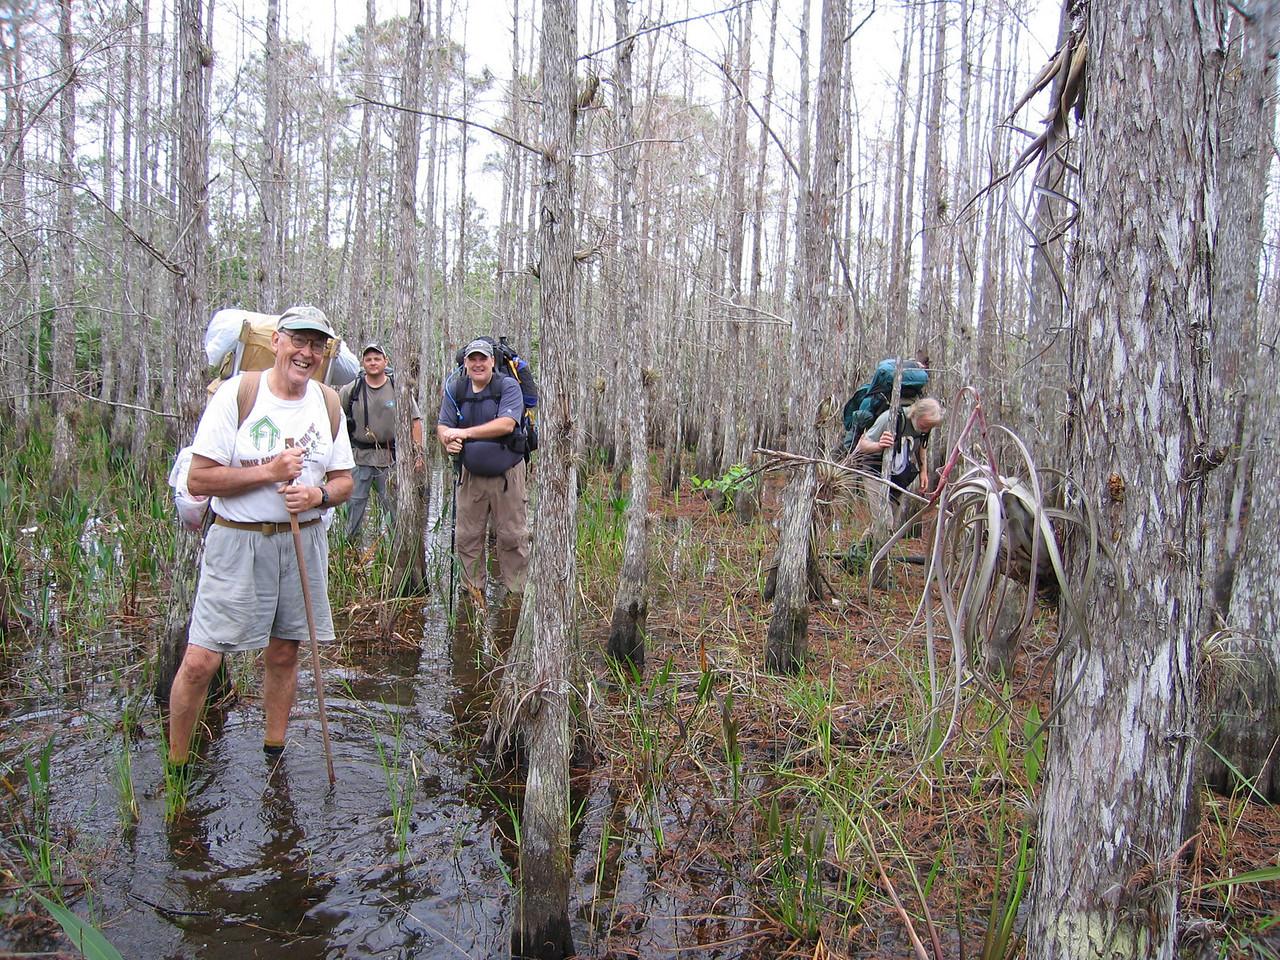 Eastbounders wading along<br /> photo credit: Raphael Clemente / Florida Trail Association